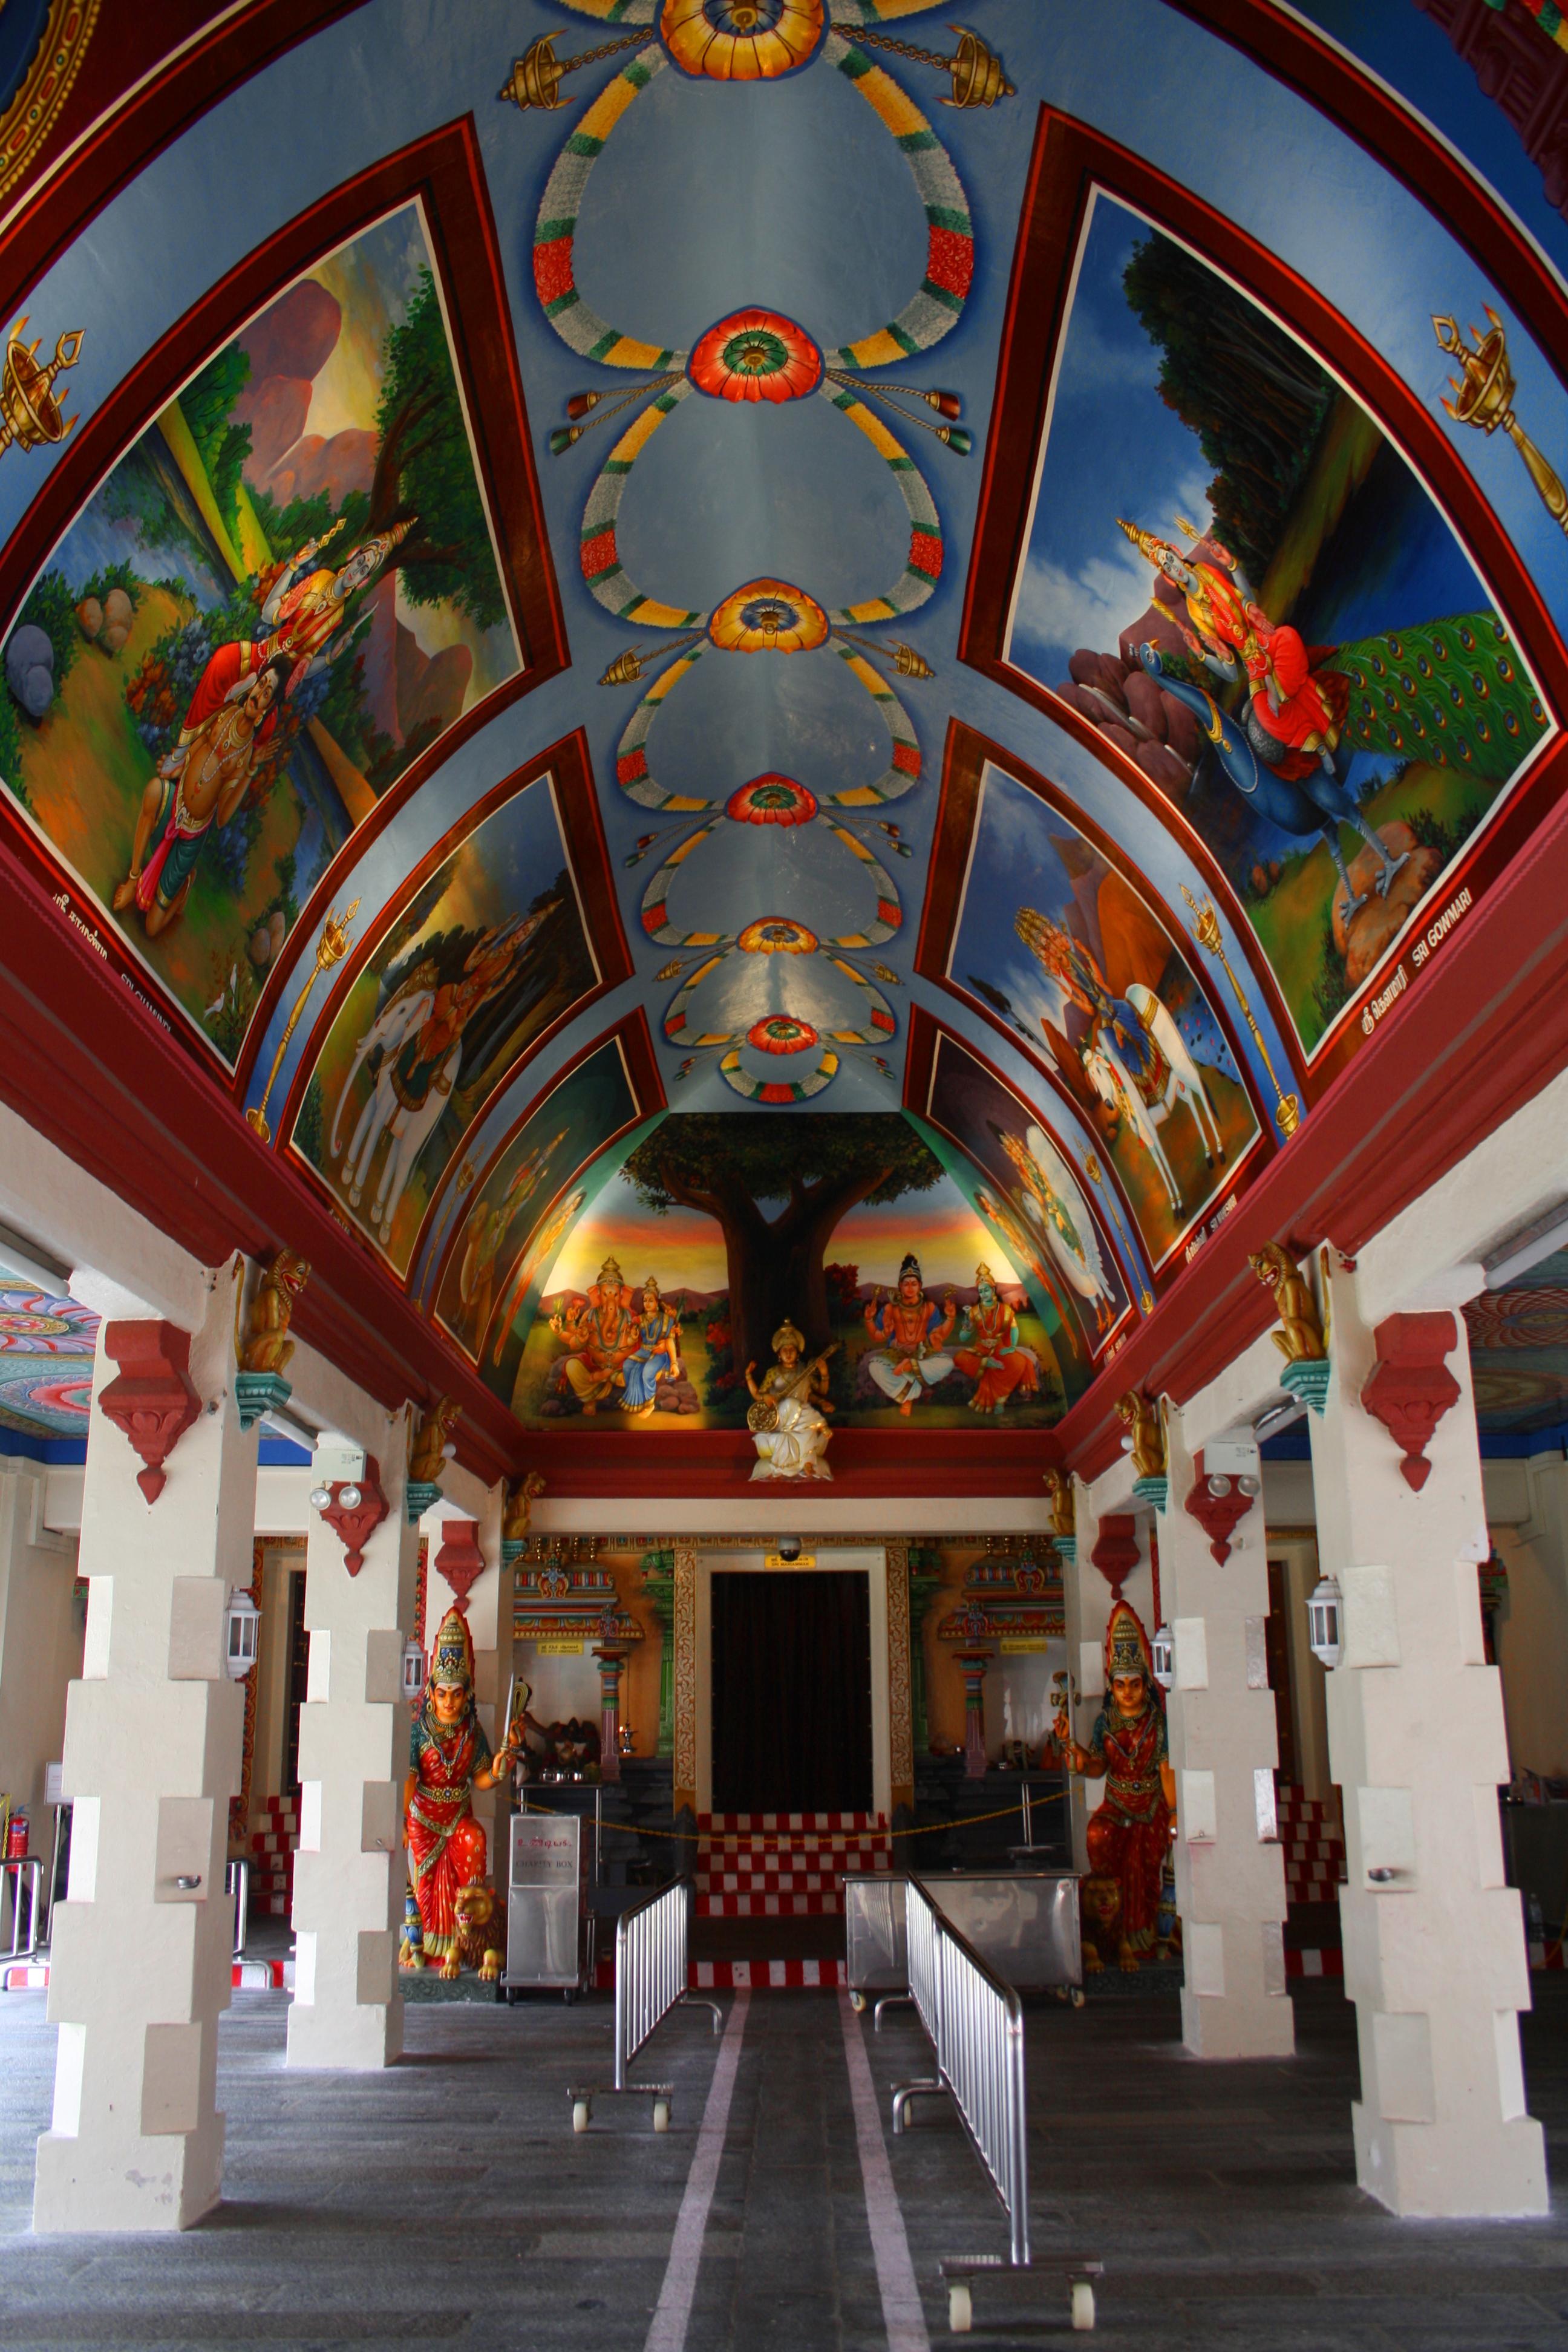 File:A view inside a Sri Mariamman Temple, Hindu ...